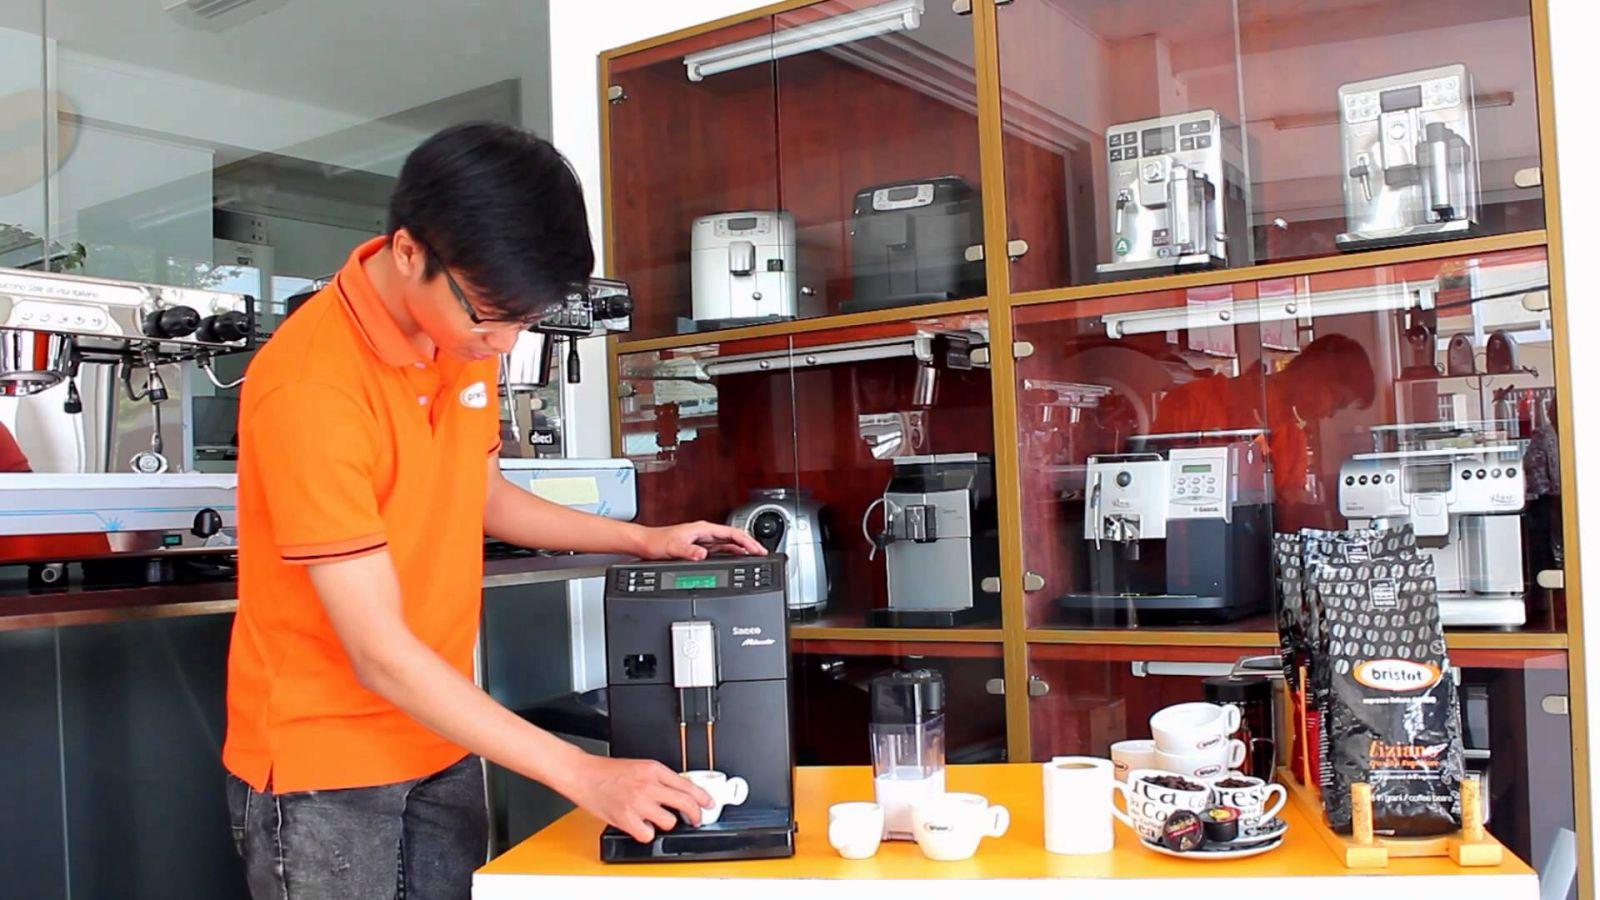 máy pha cà phê Nescafe Alegria